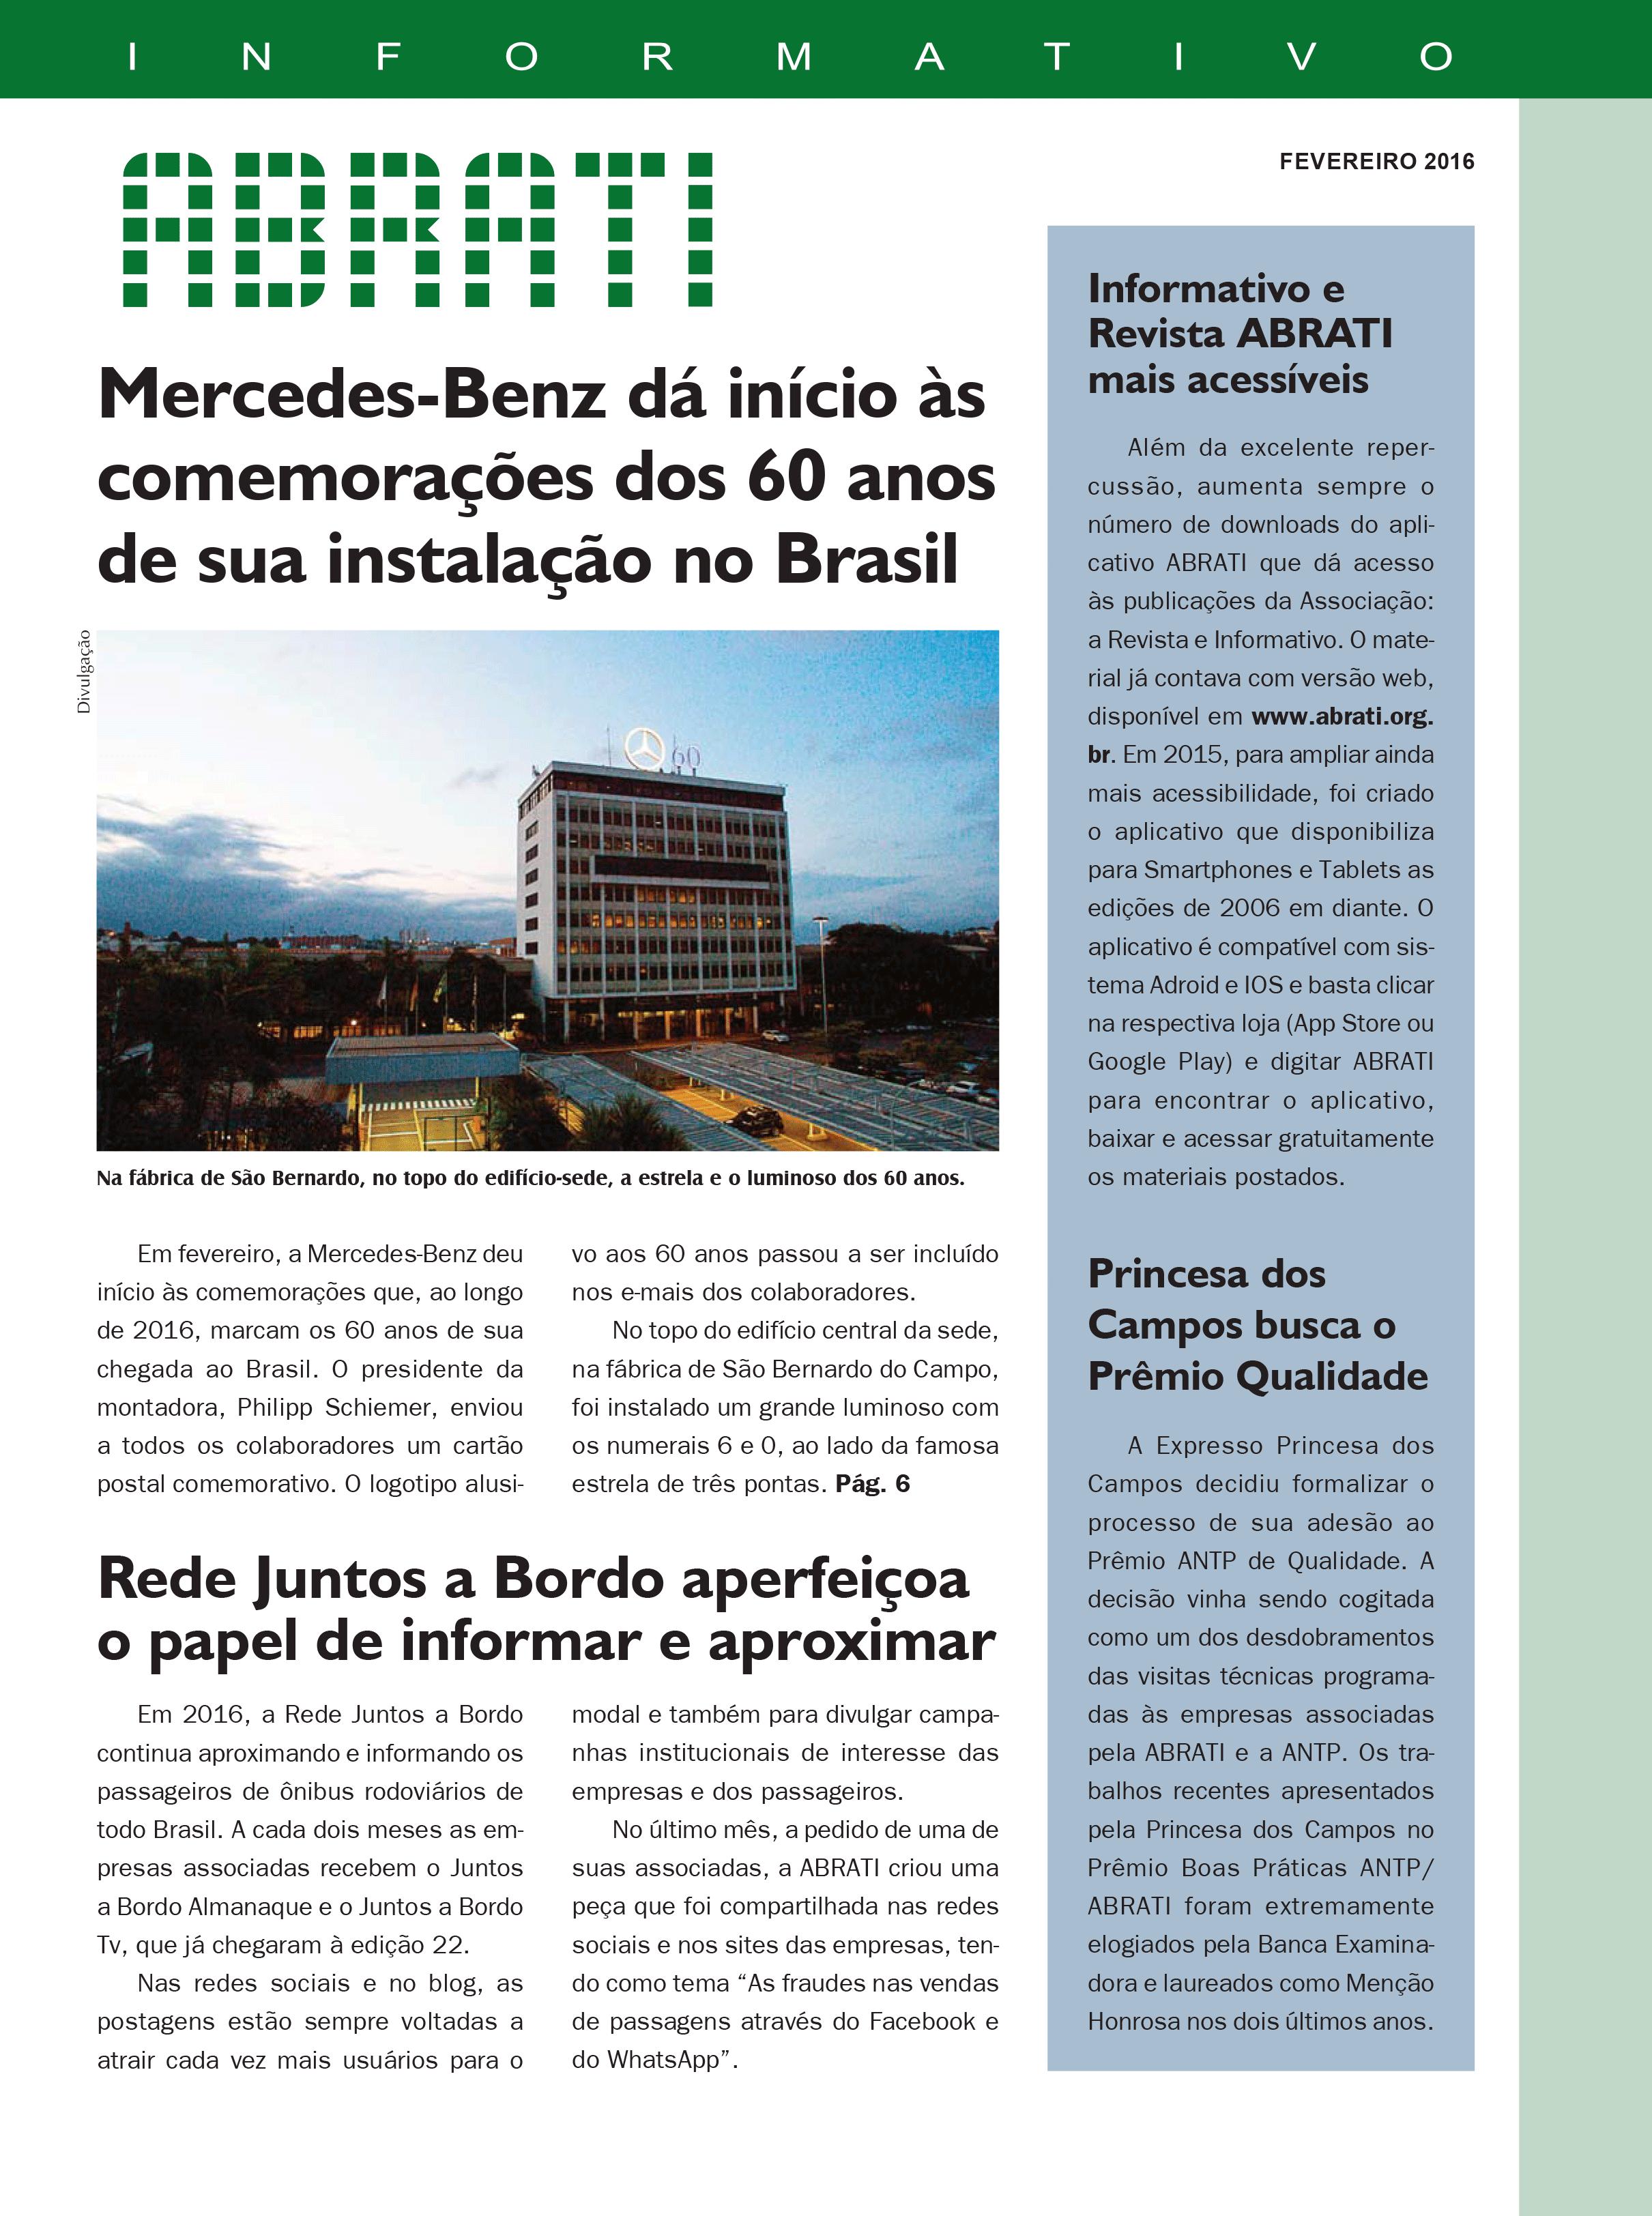 Informativo Fevereiro 2016